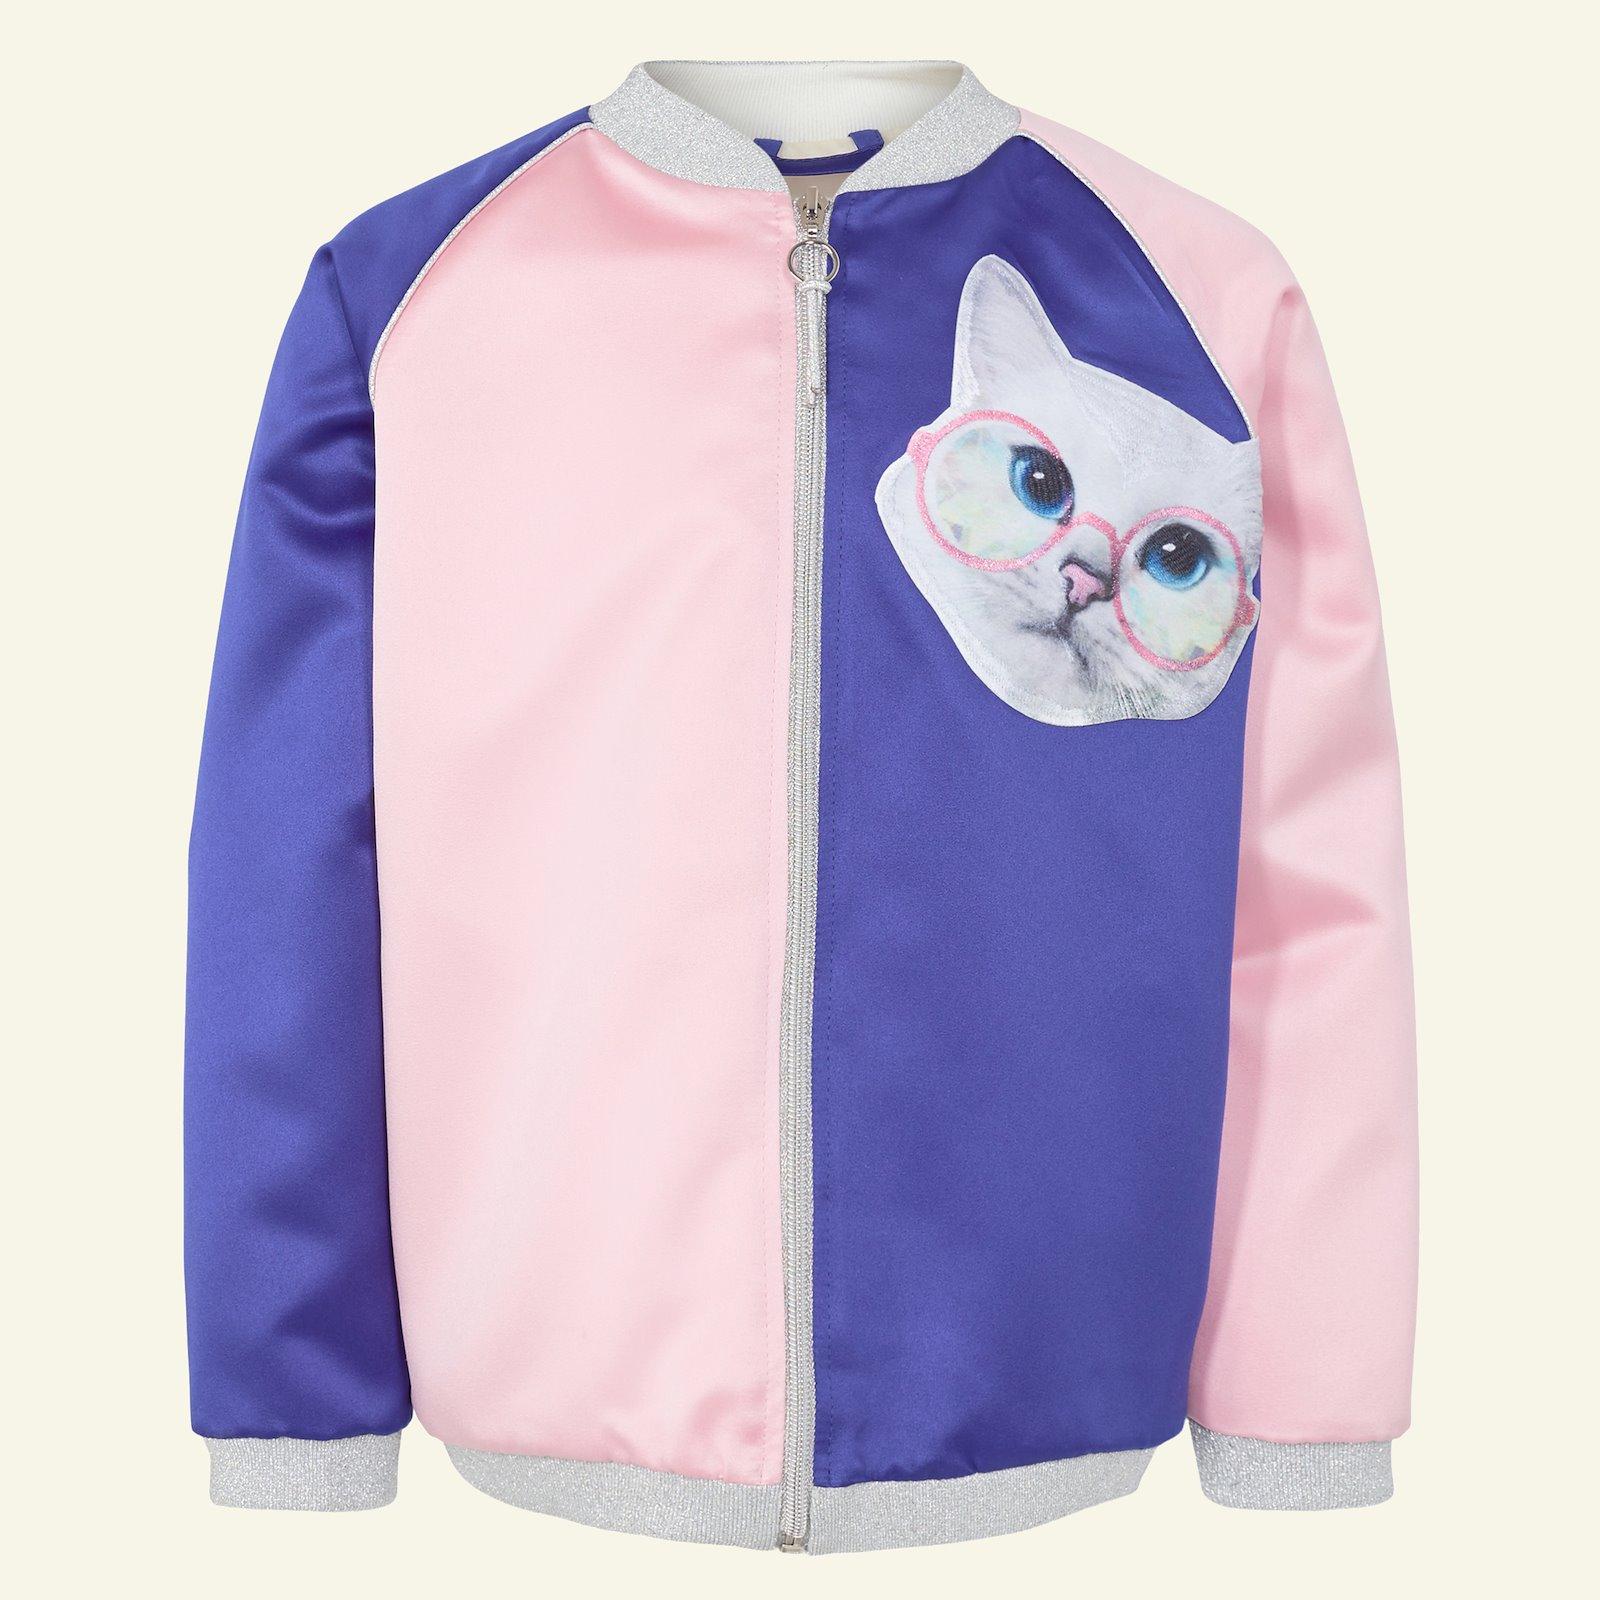 Duchess satin baby pink p64017_620417_620094_96111_72078_26436_sskit